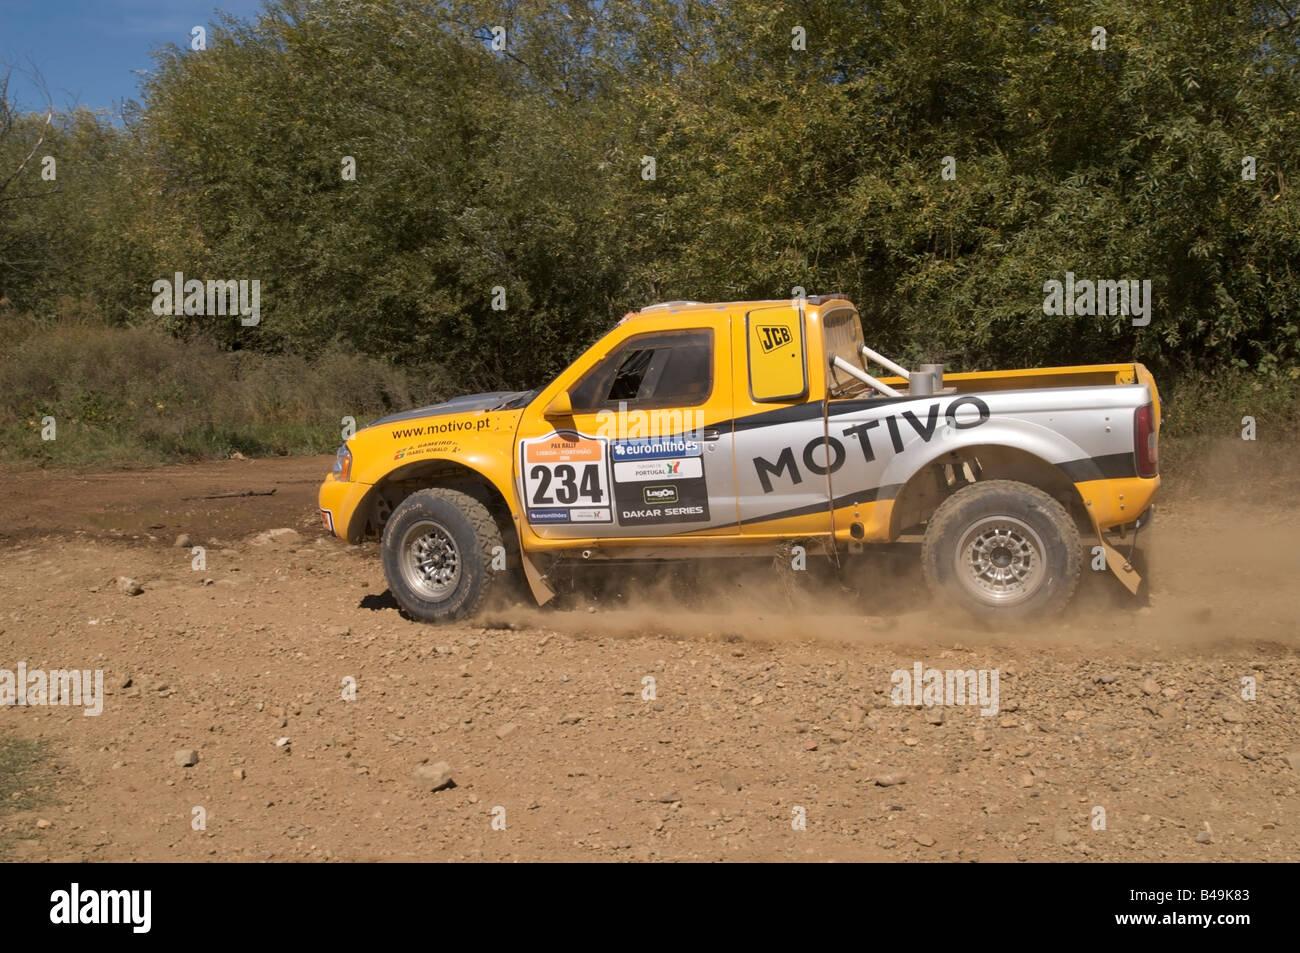 Pax Rally - Lisboa-Portimão - Dakar series - car 234 - Motivo team - Alexandra Gameiro e Isabel Robalo Immagini Stock